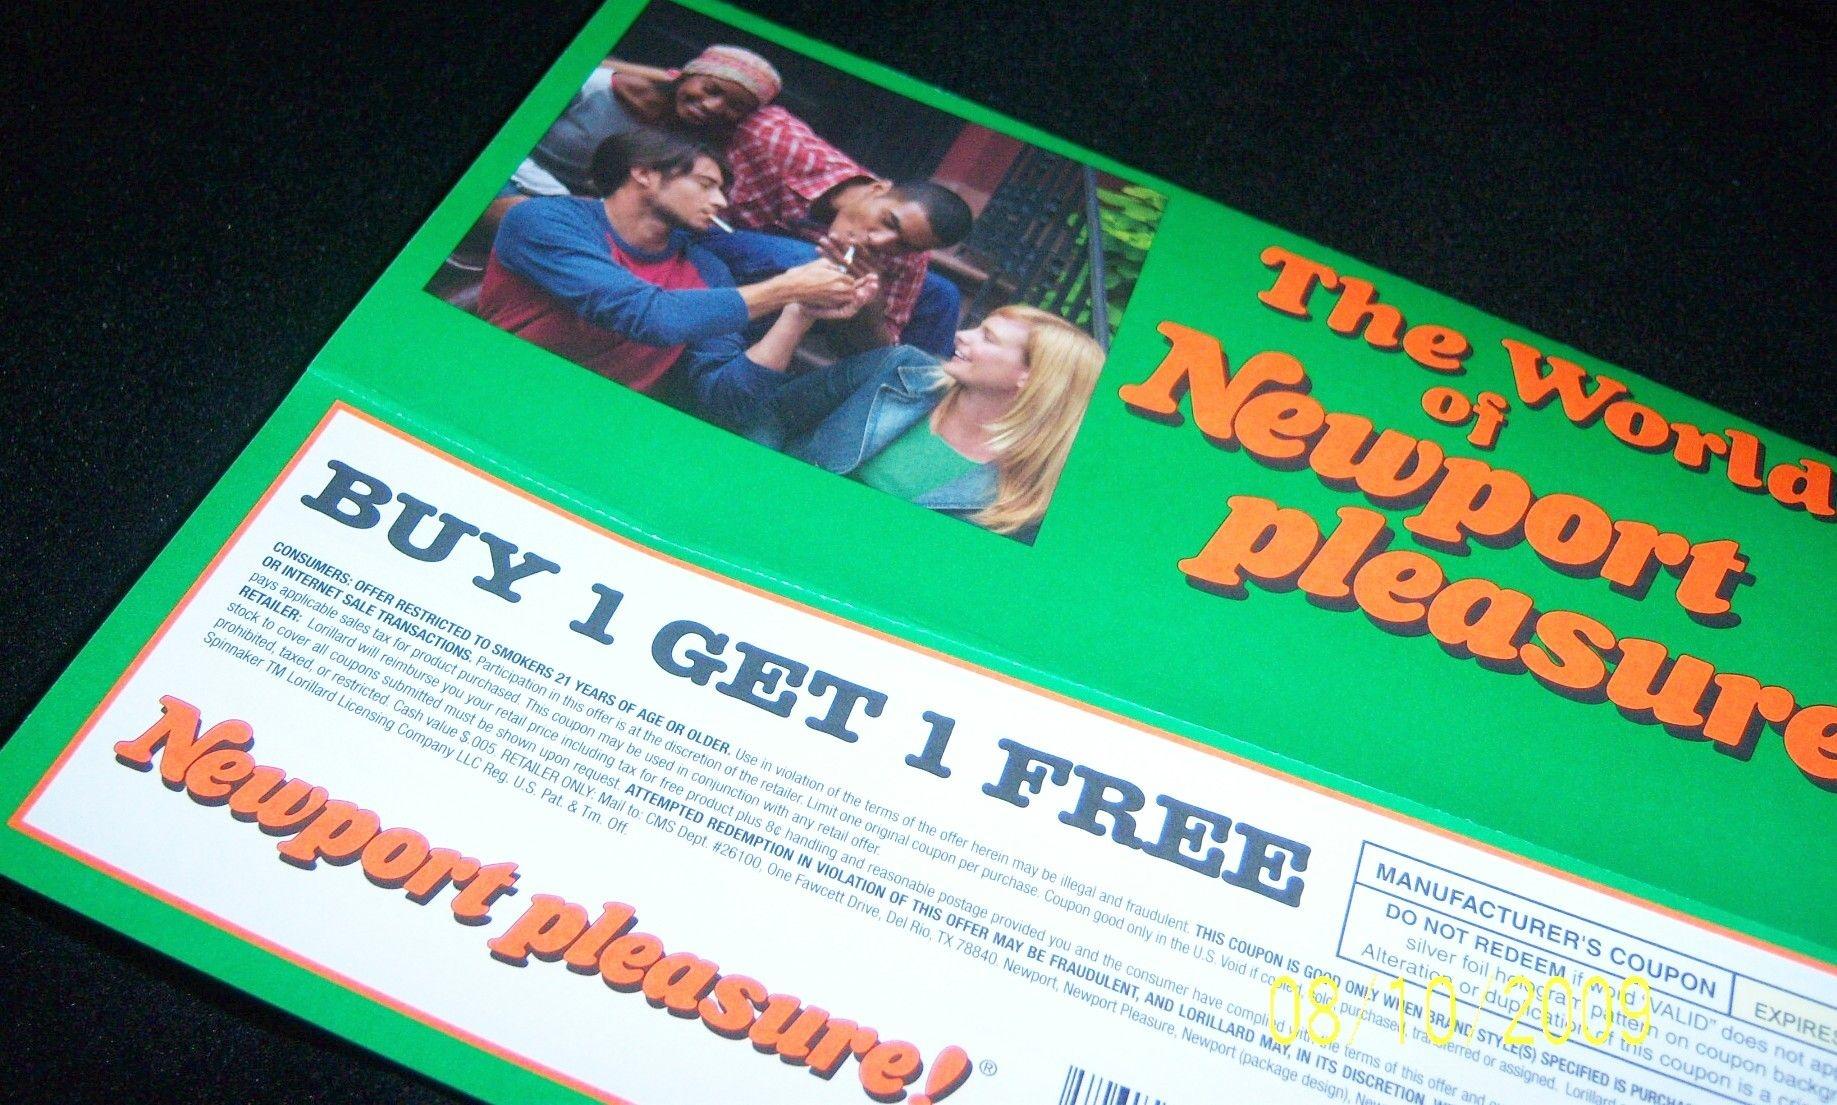 Pindebi On Coupons   Newport Cigarettes, Cigarette Coupons Free - Free Printable Newport Cigarette Coupons